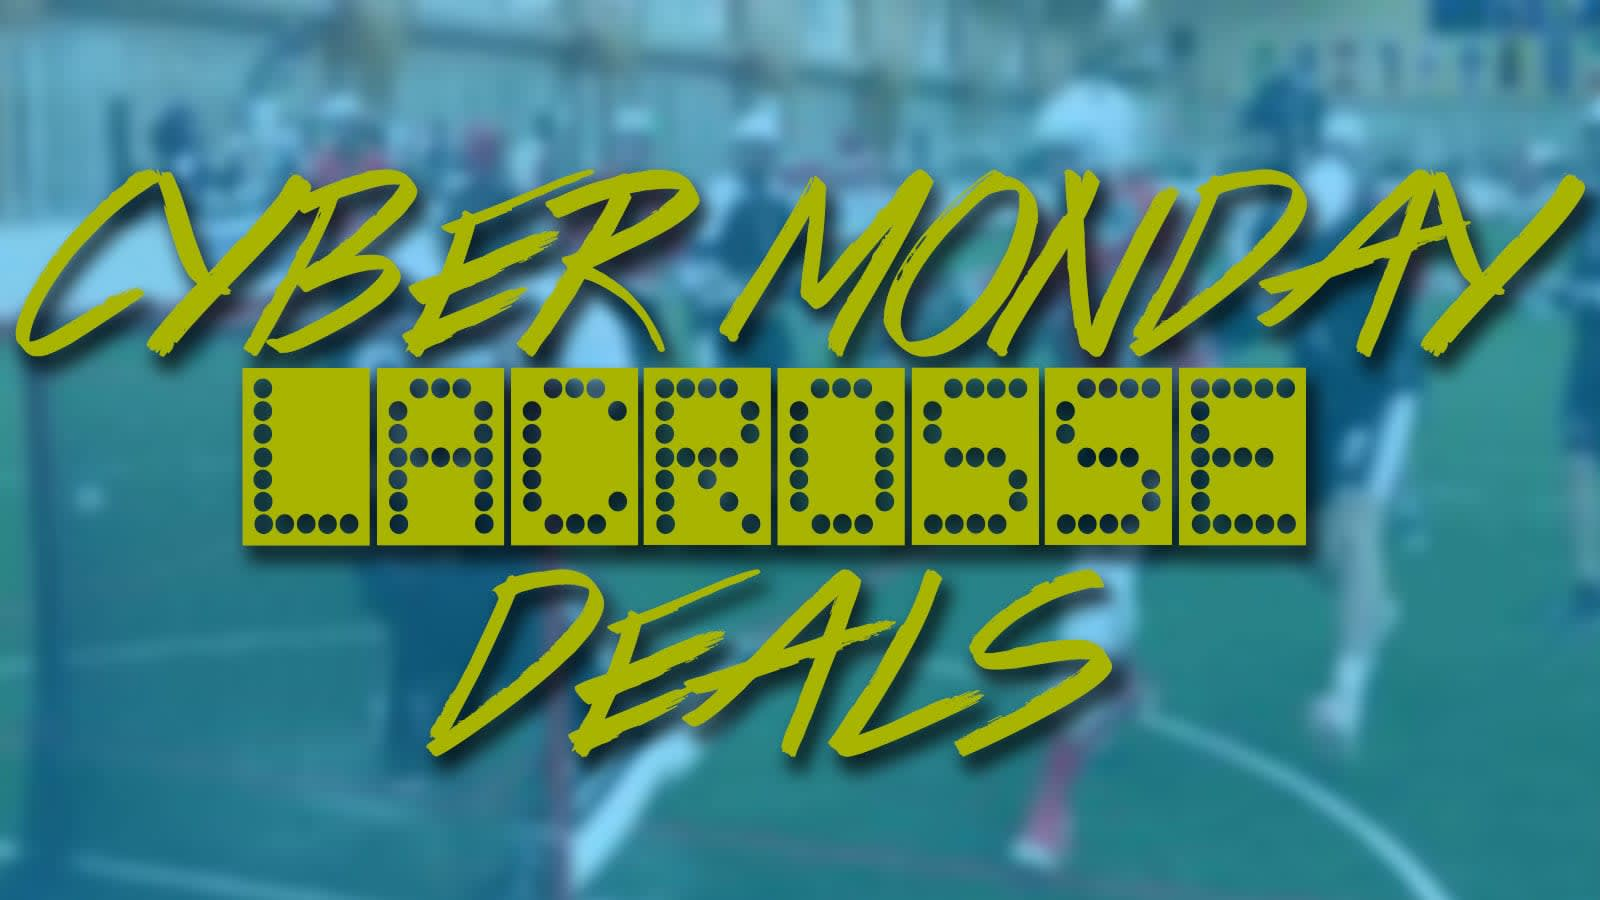 Cyber monday 2017 lacrosse